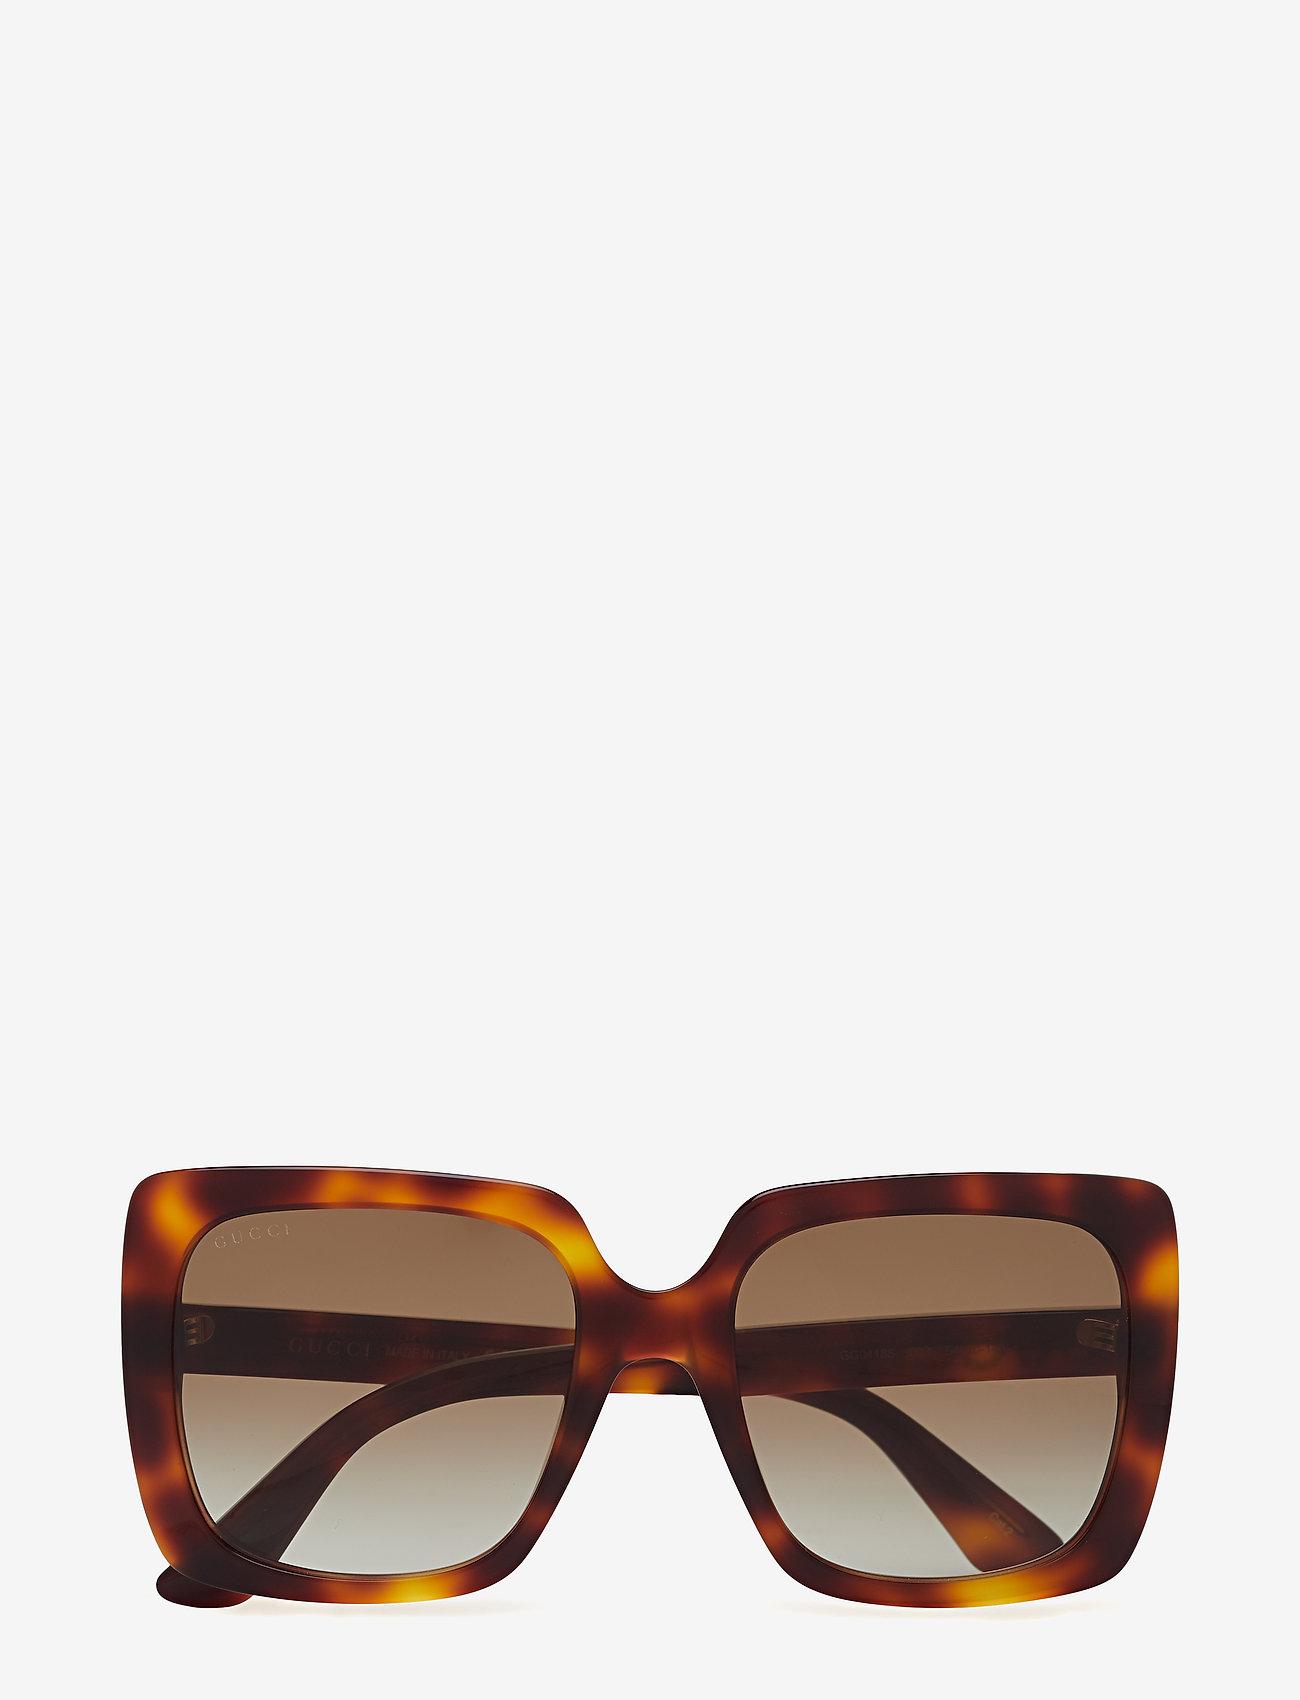 Gucci Sunglasses - GG0418S - neliökehys - havana-havana-brown - 0